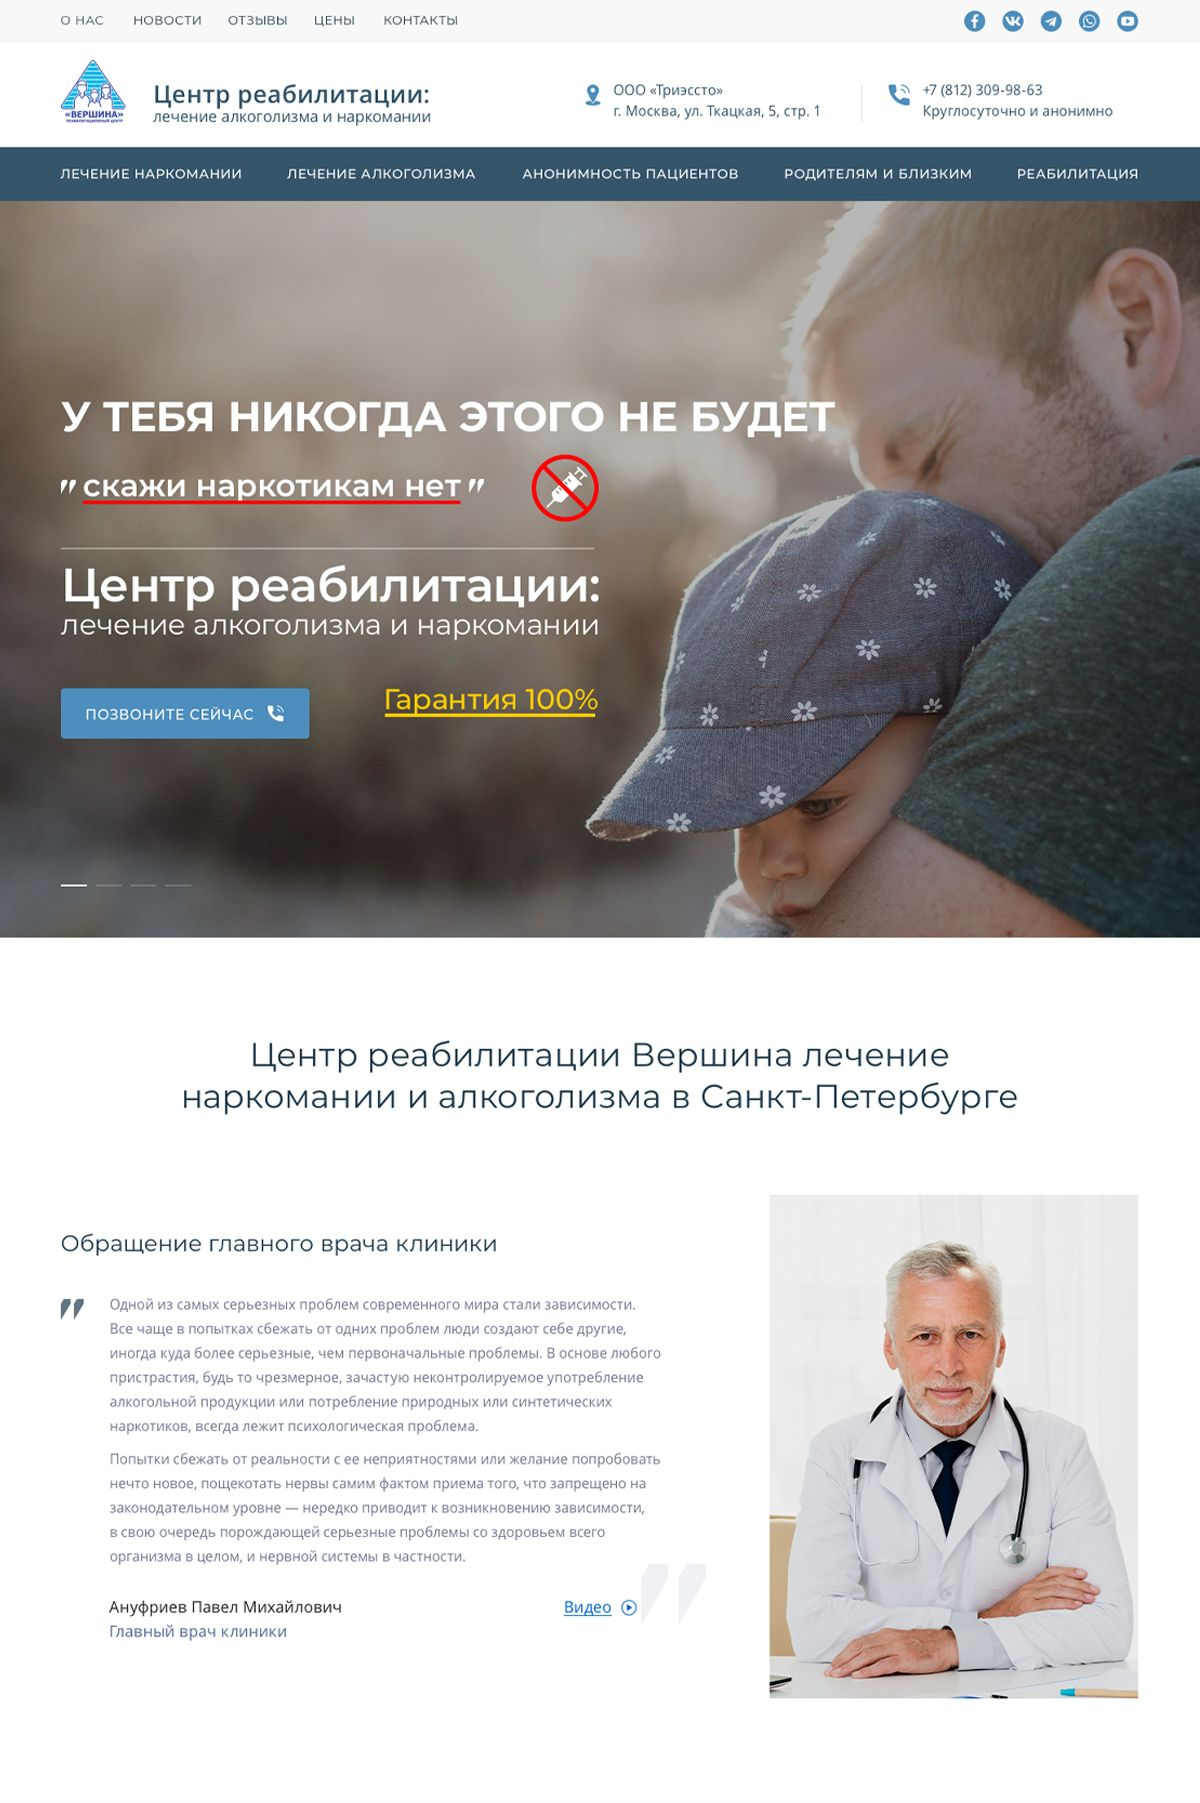 Веб-сайт для http://vershina-spb.ru/ - дизайнер reyburn